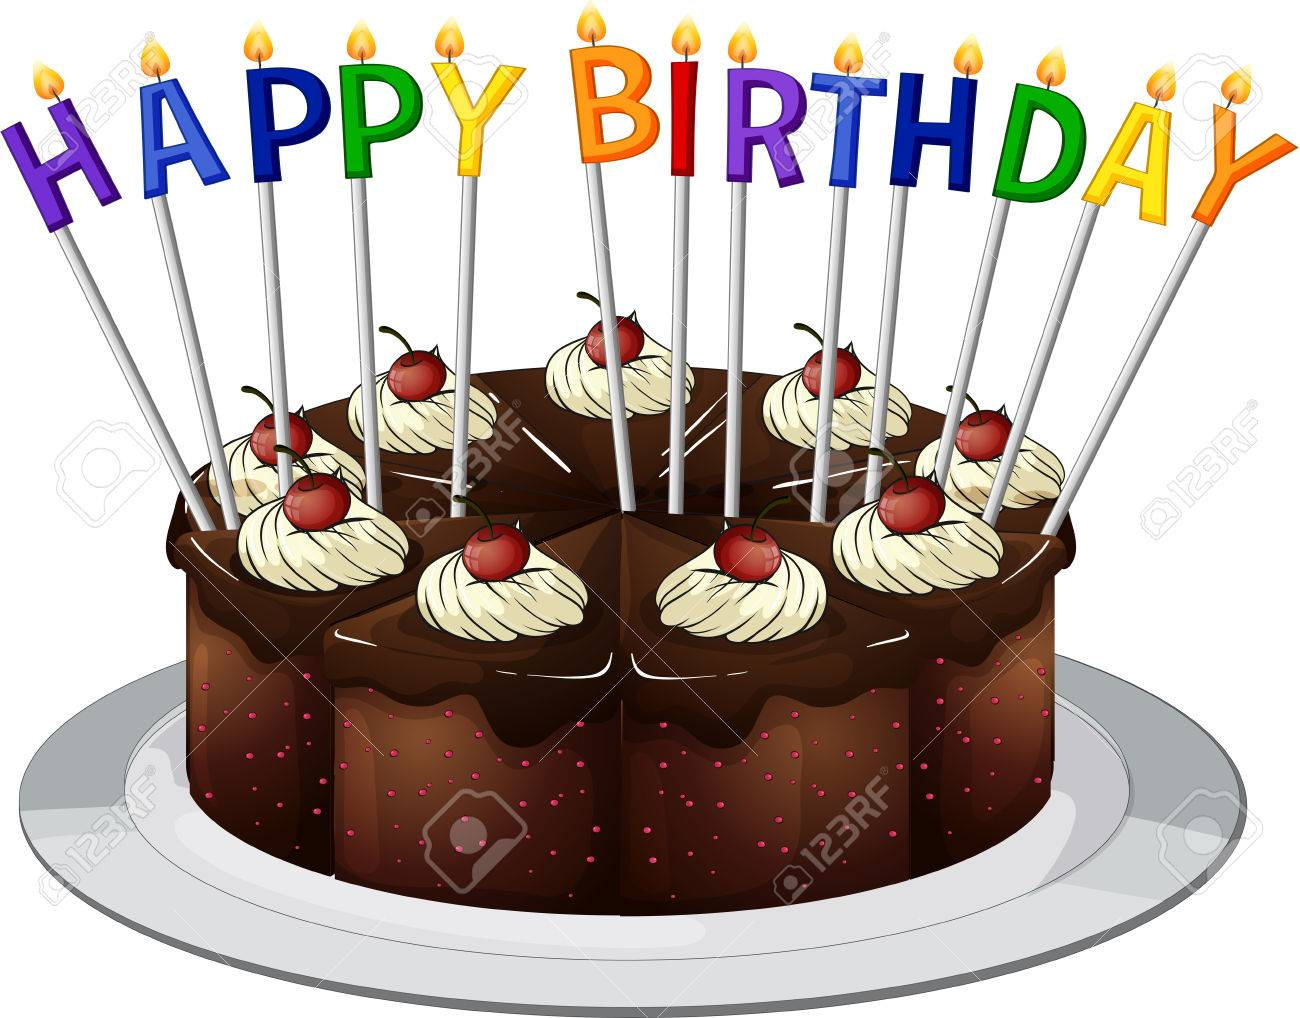 Birthday Cards Cake ~ Homemade birthday card the saturday evening post